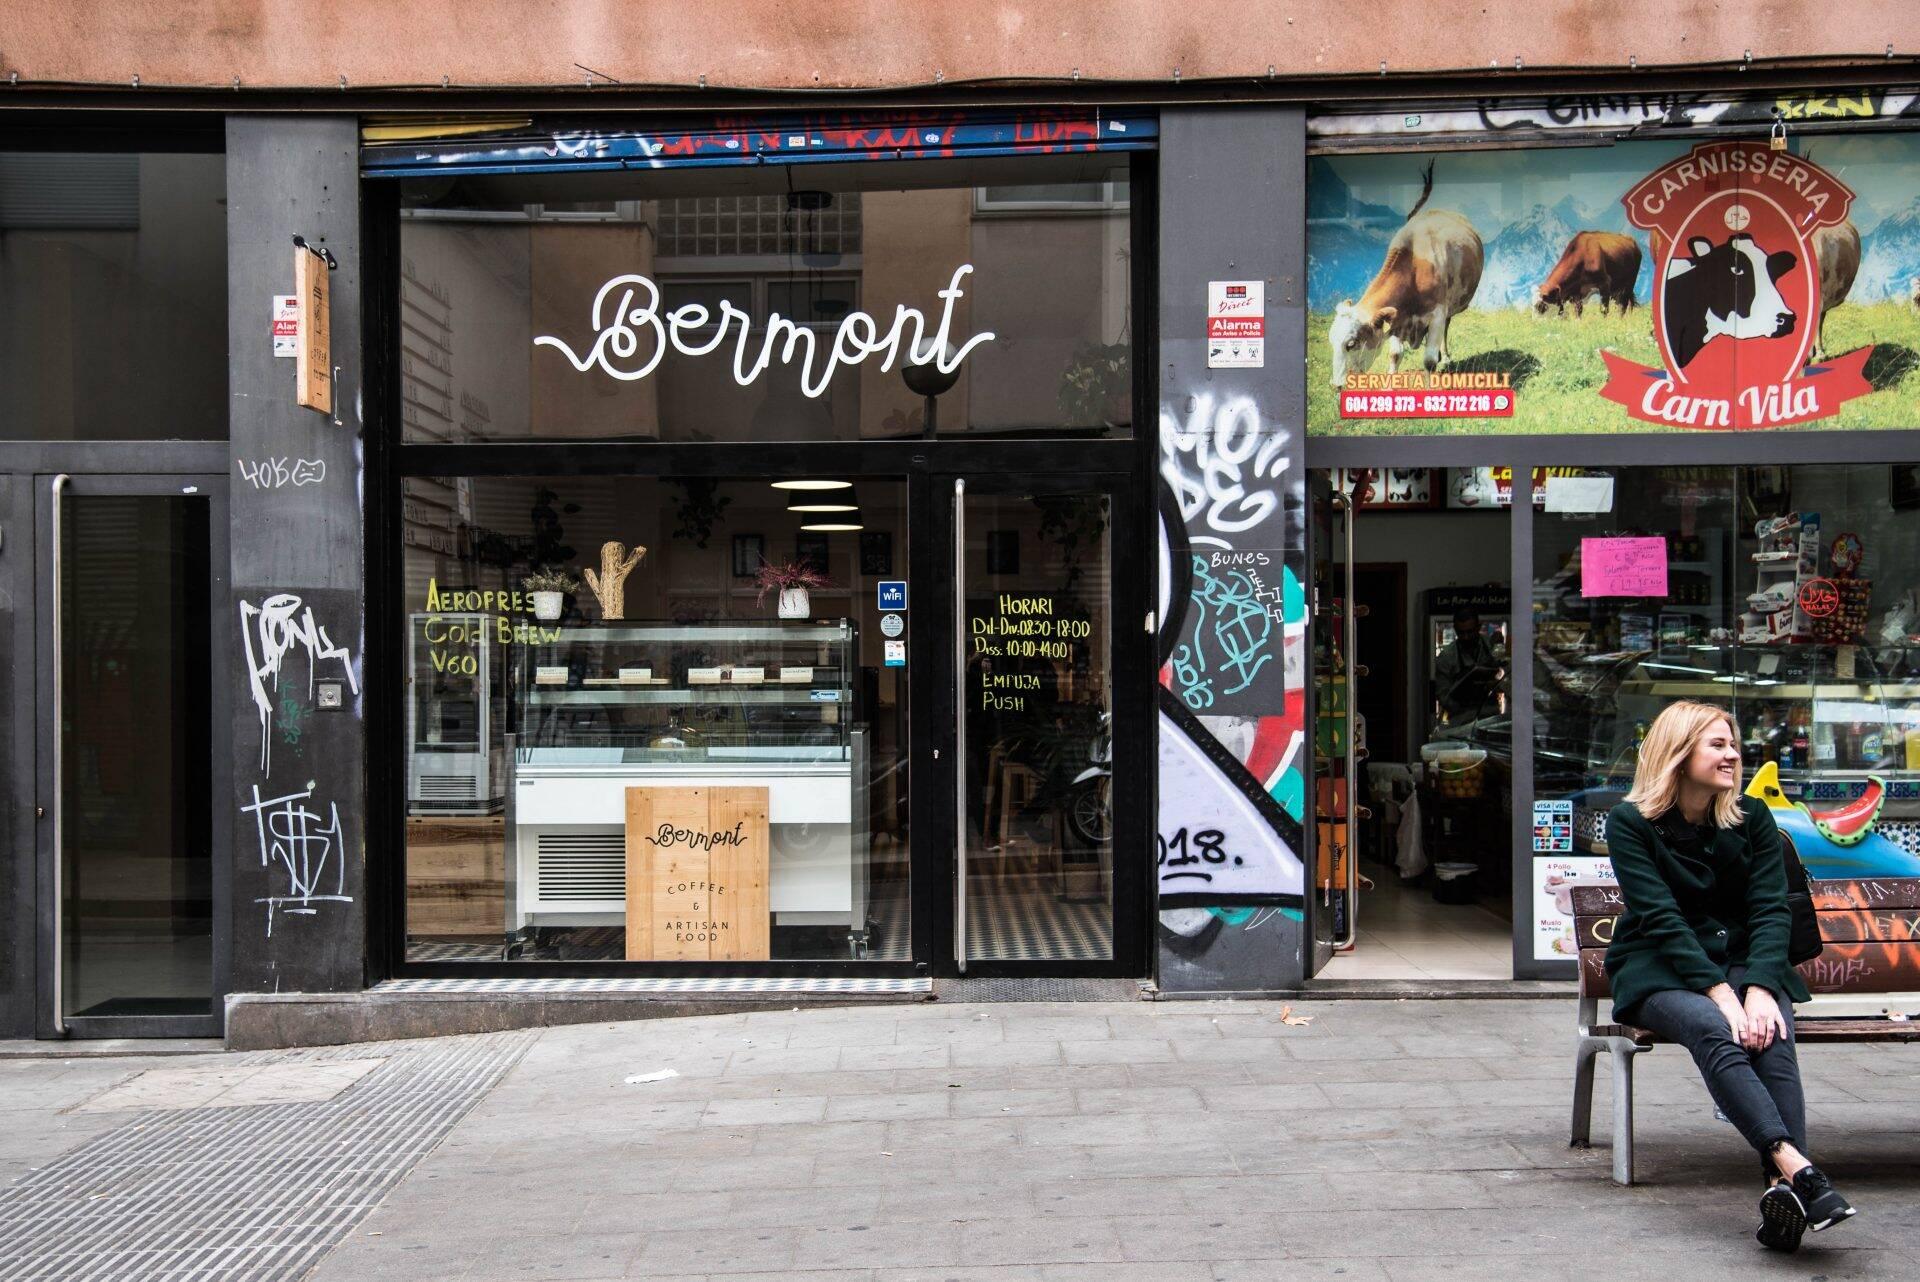 Bermont Coffee in Barcelona